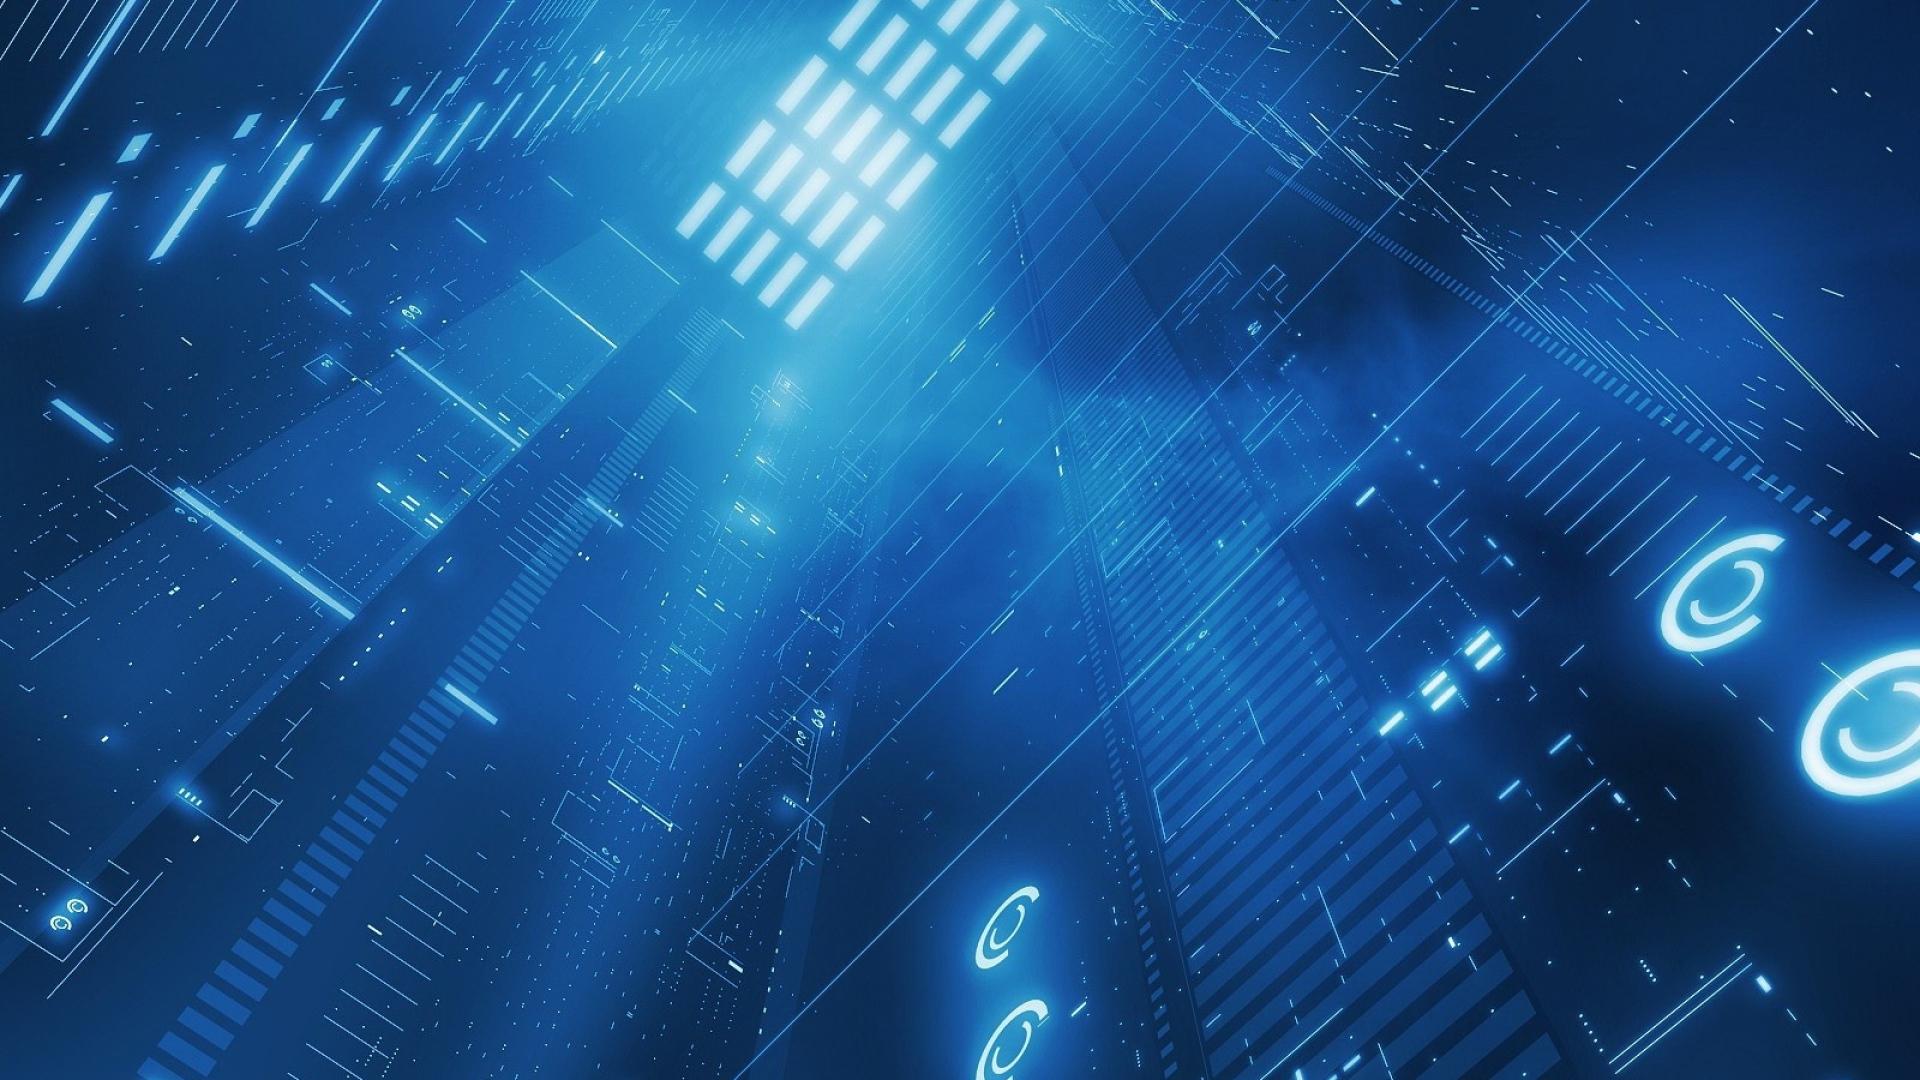 information, circuits, lights